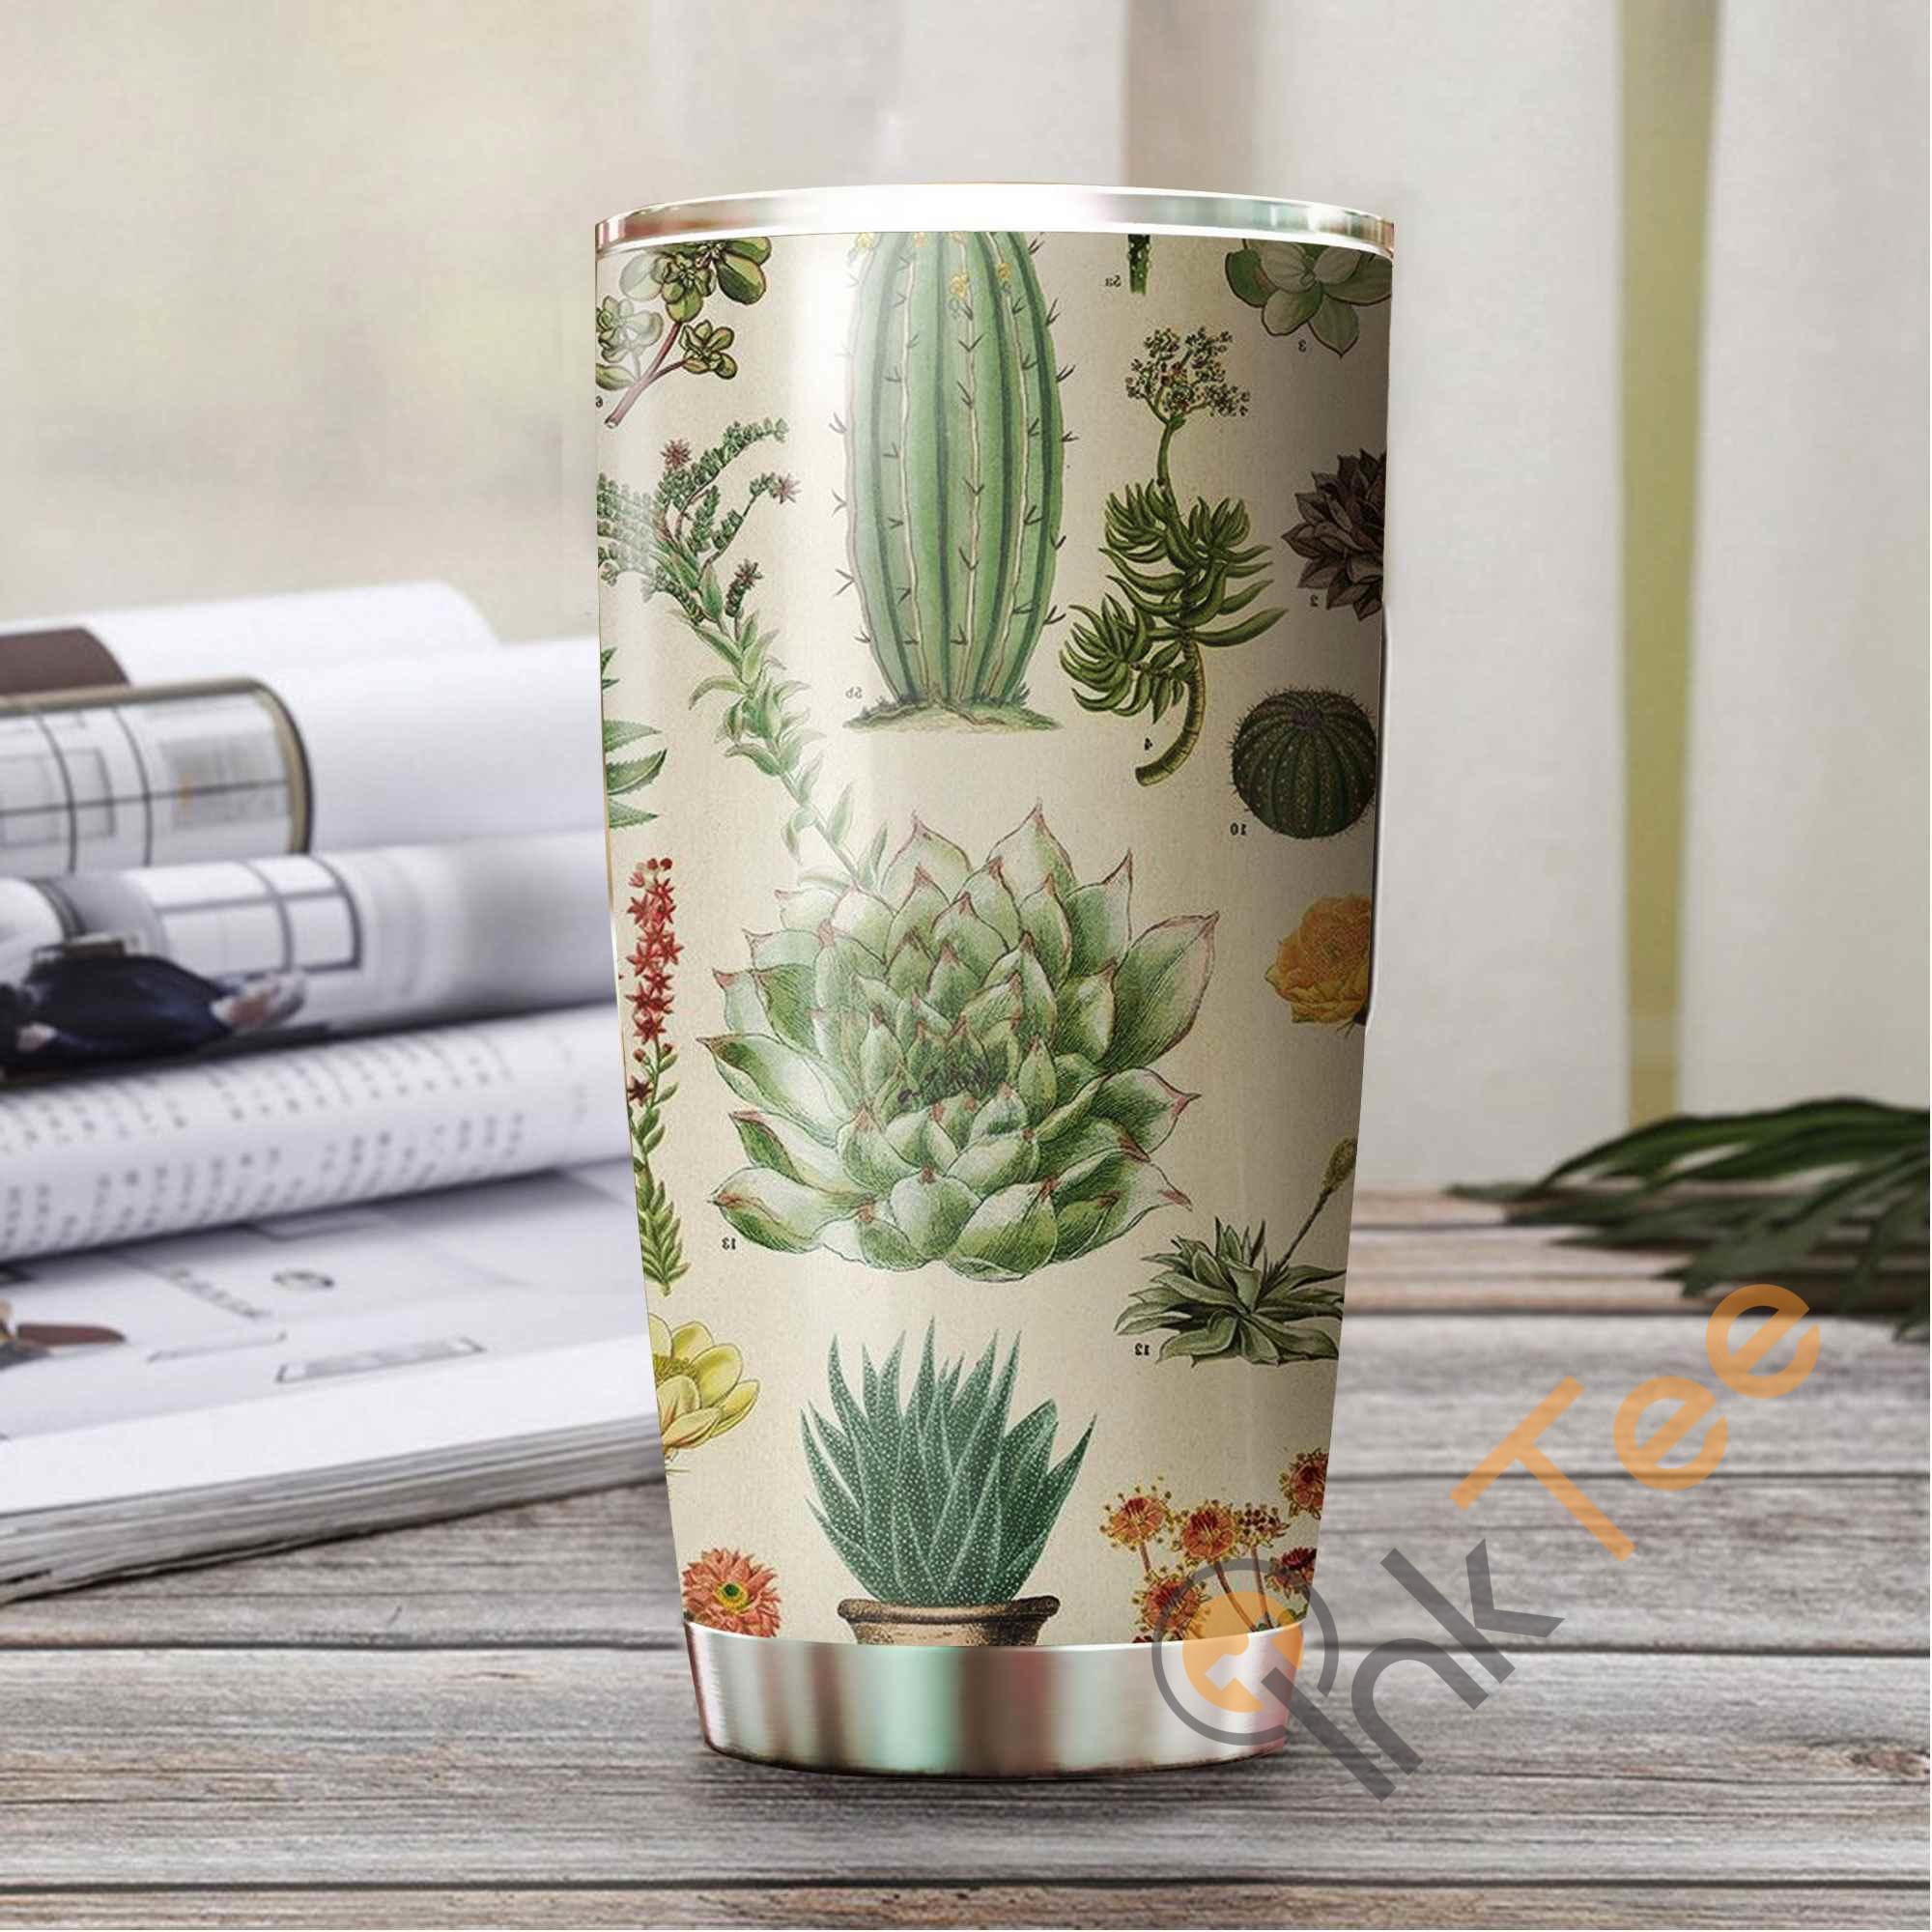 Love Cactus Amazon Best Seller Sku 2992 Stainless Steel Tumbler